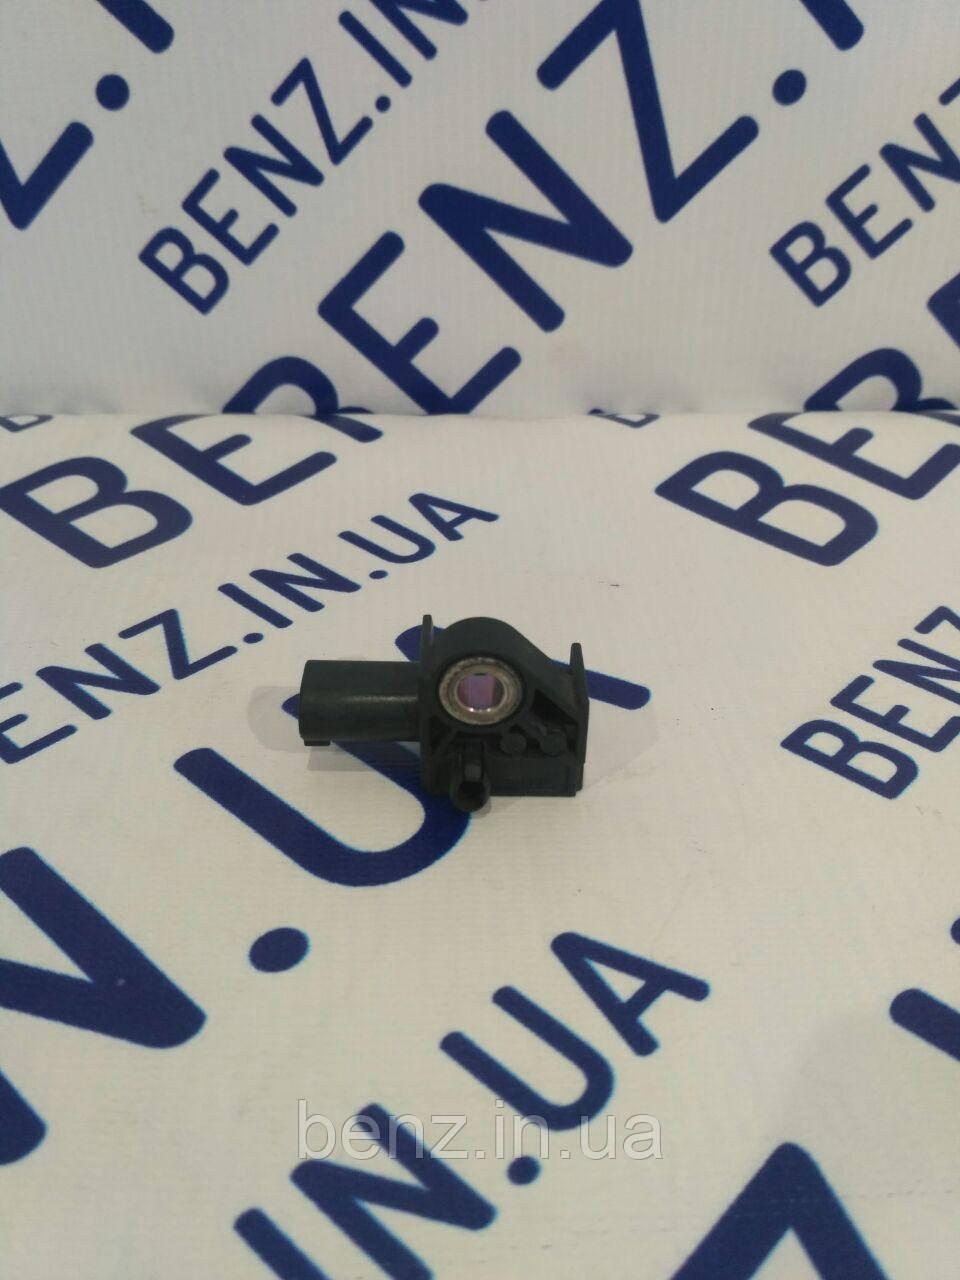 Датчик удара подушки безопасности W212 рестайл A1729056000